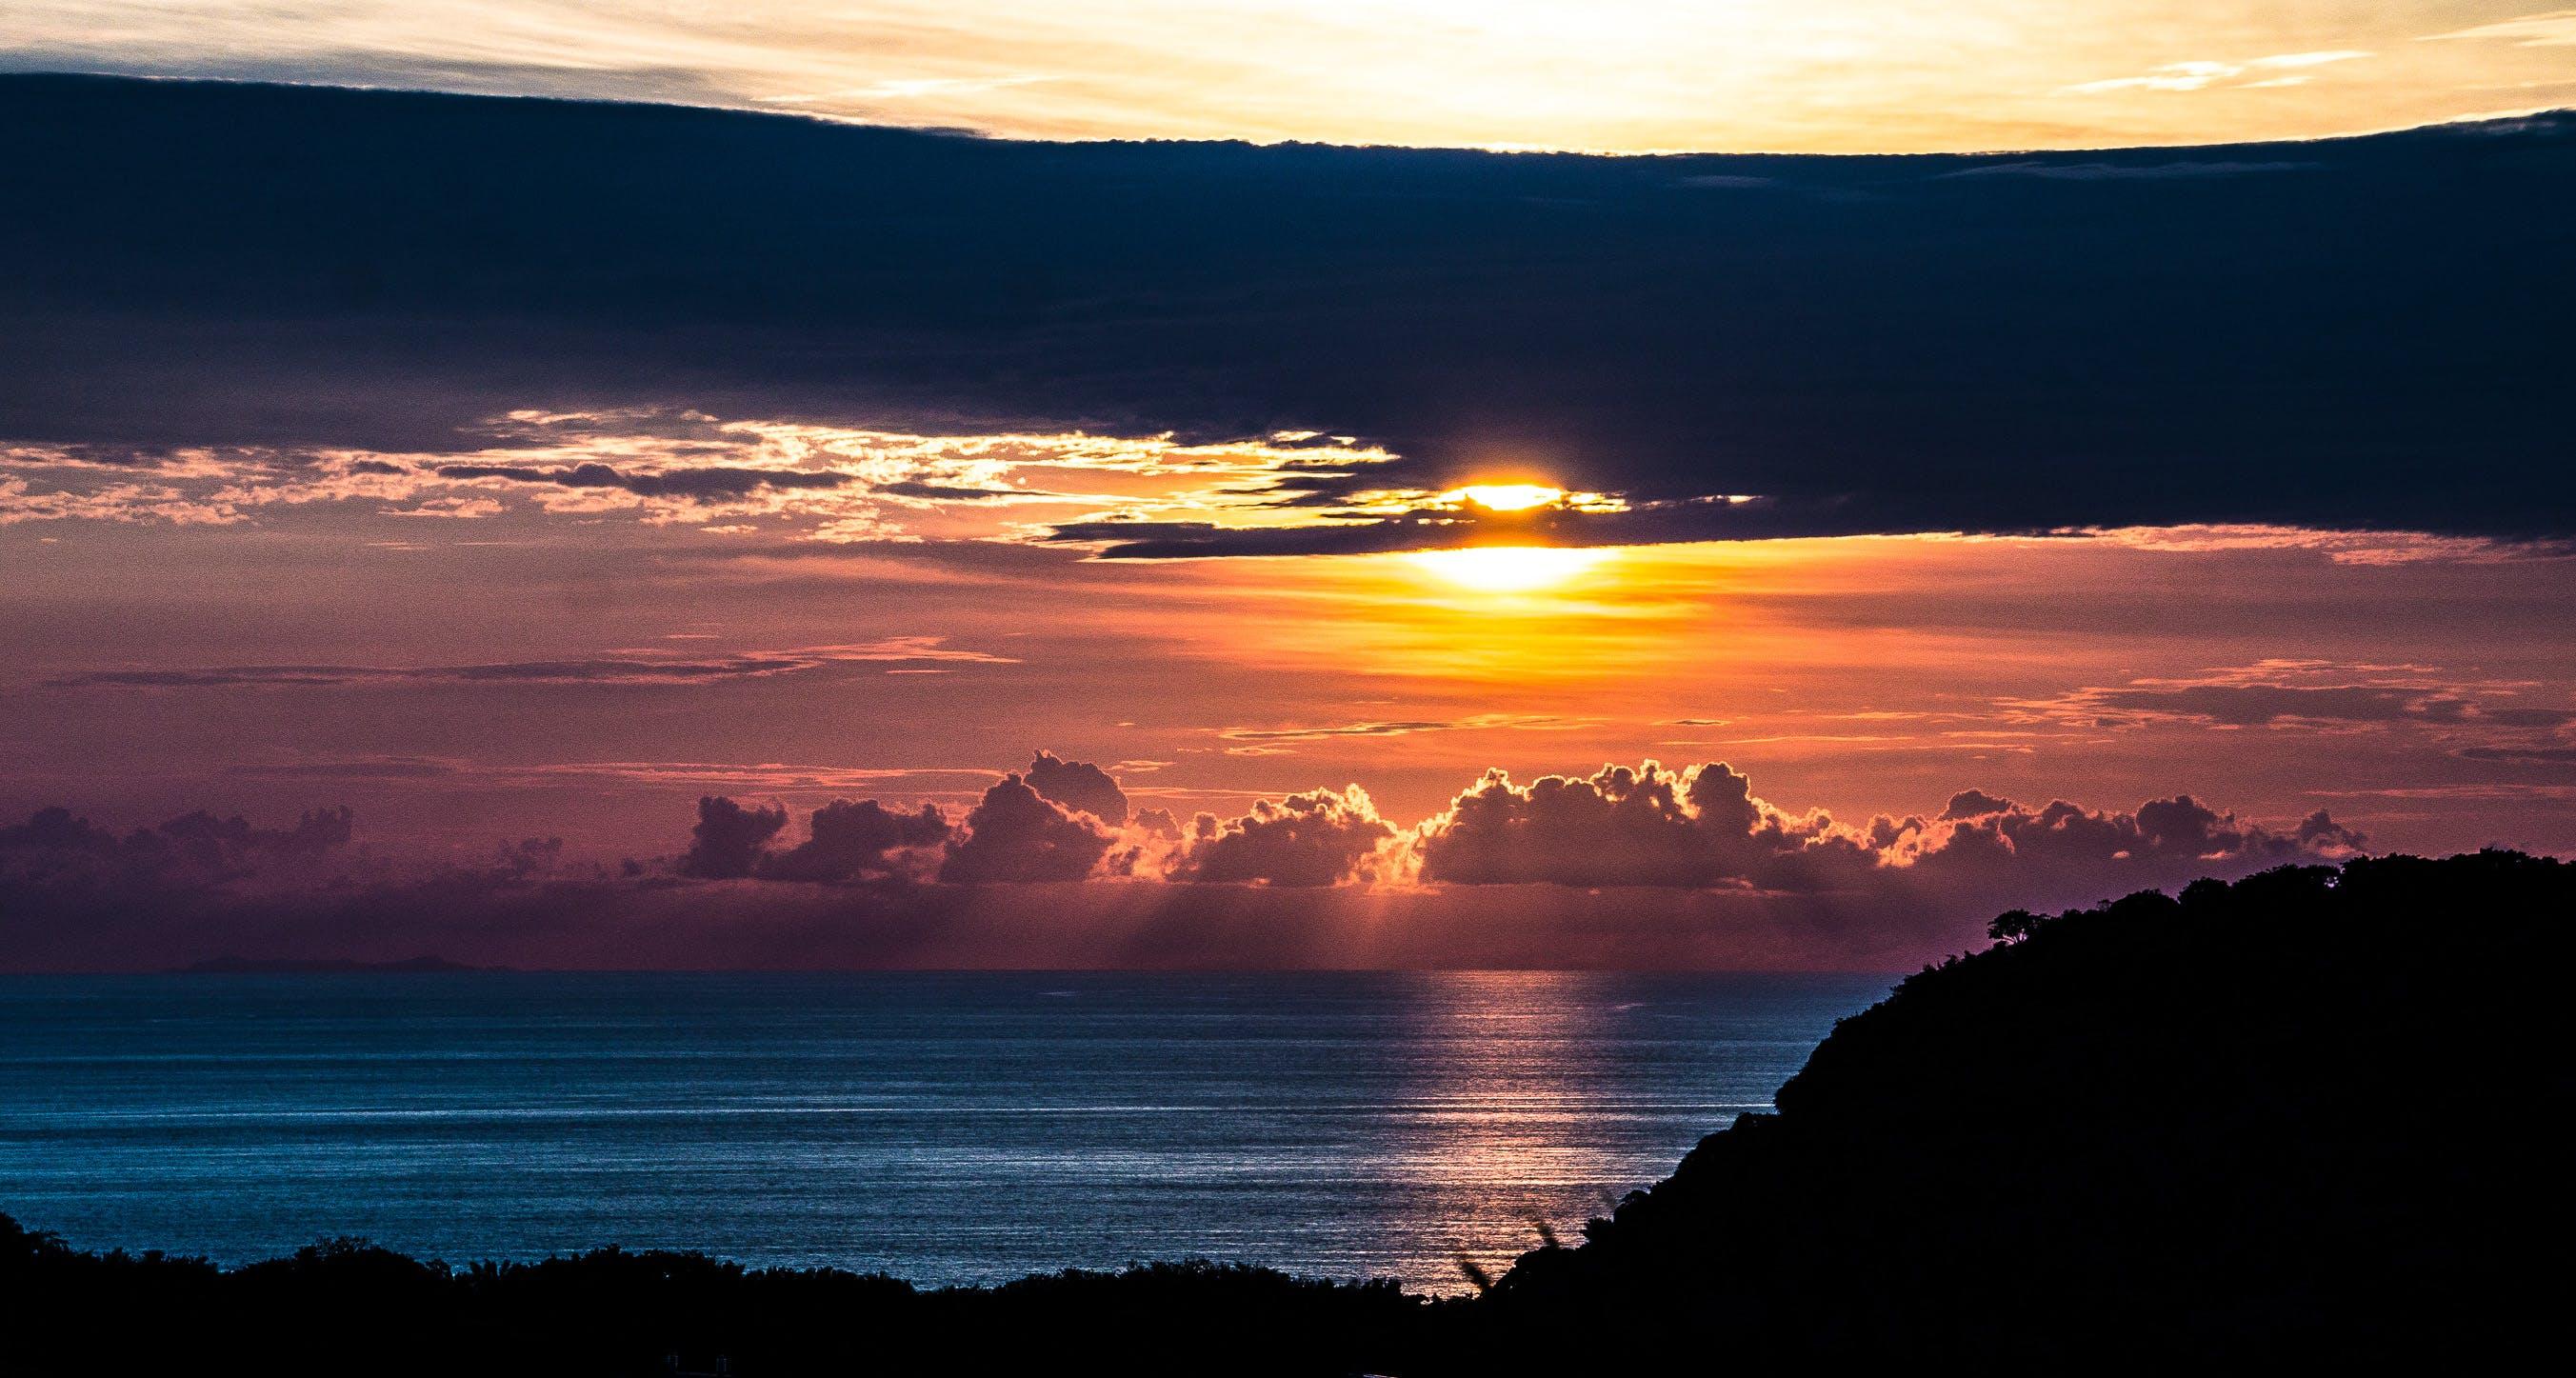 amazing sunset, beach, clouds